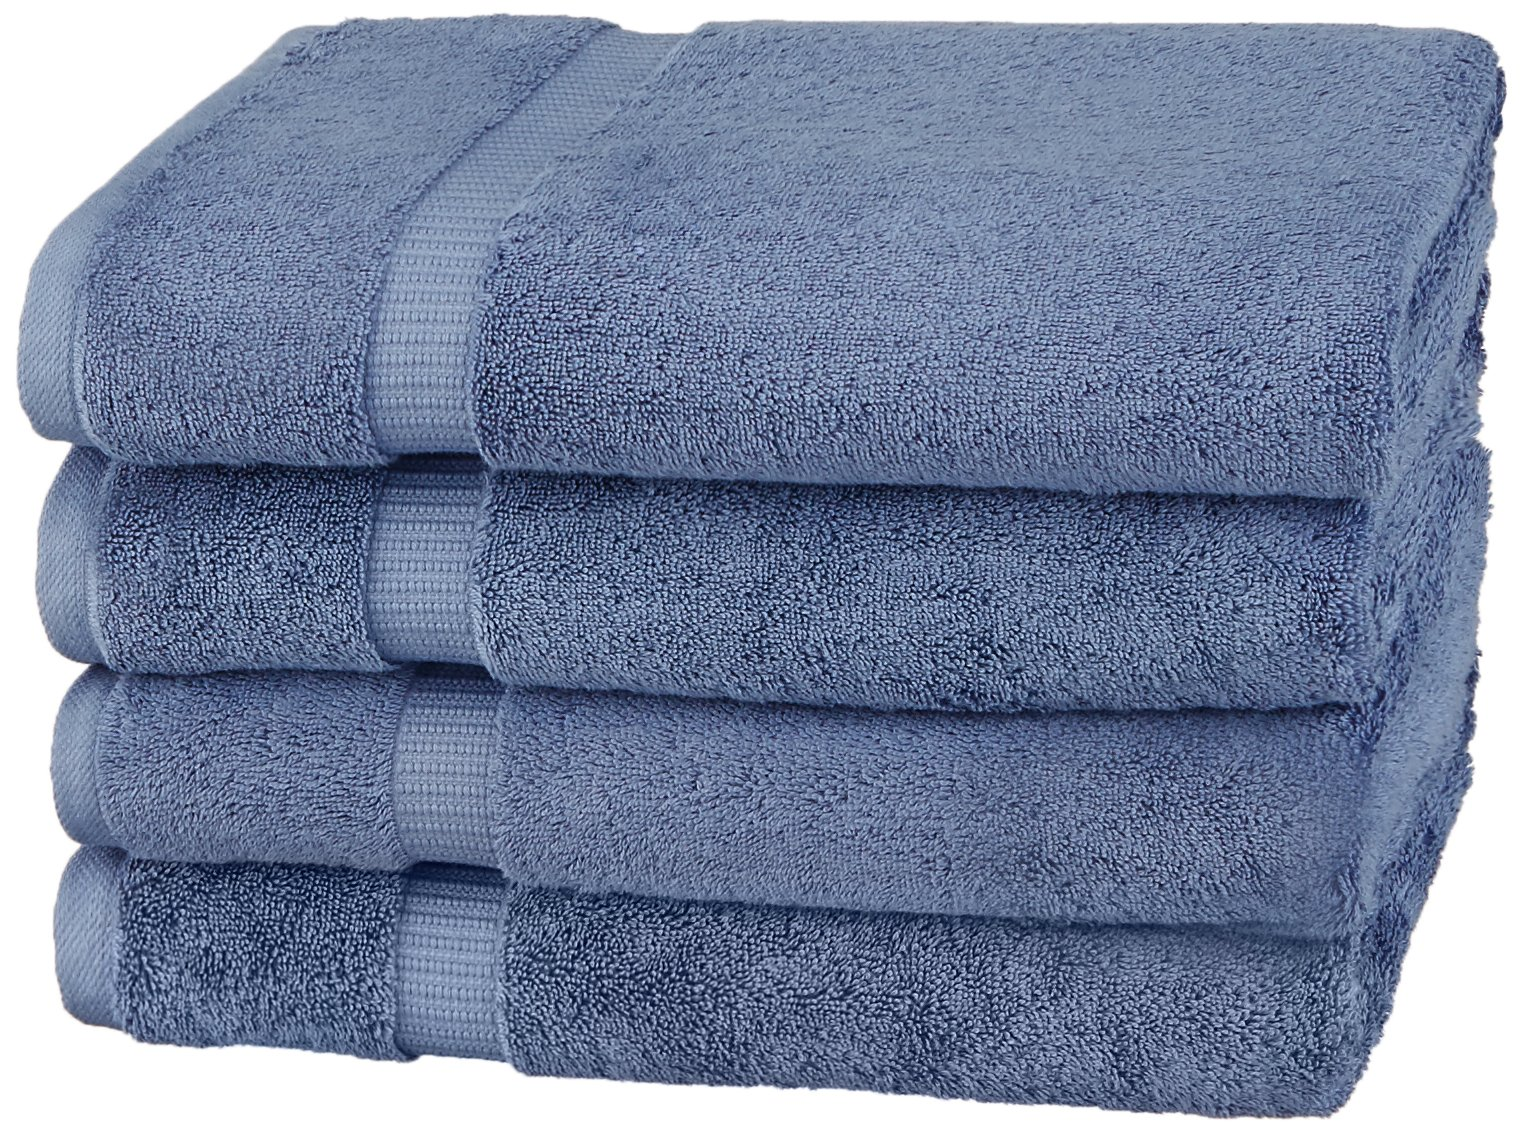 Pinzon by Amazon Collection Pinzon Organic Cotton Bath Towel (4-Pack), Indigo Blue